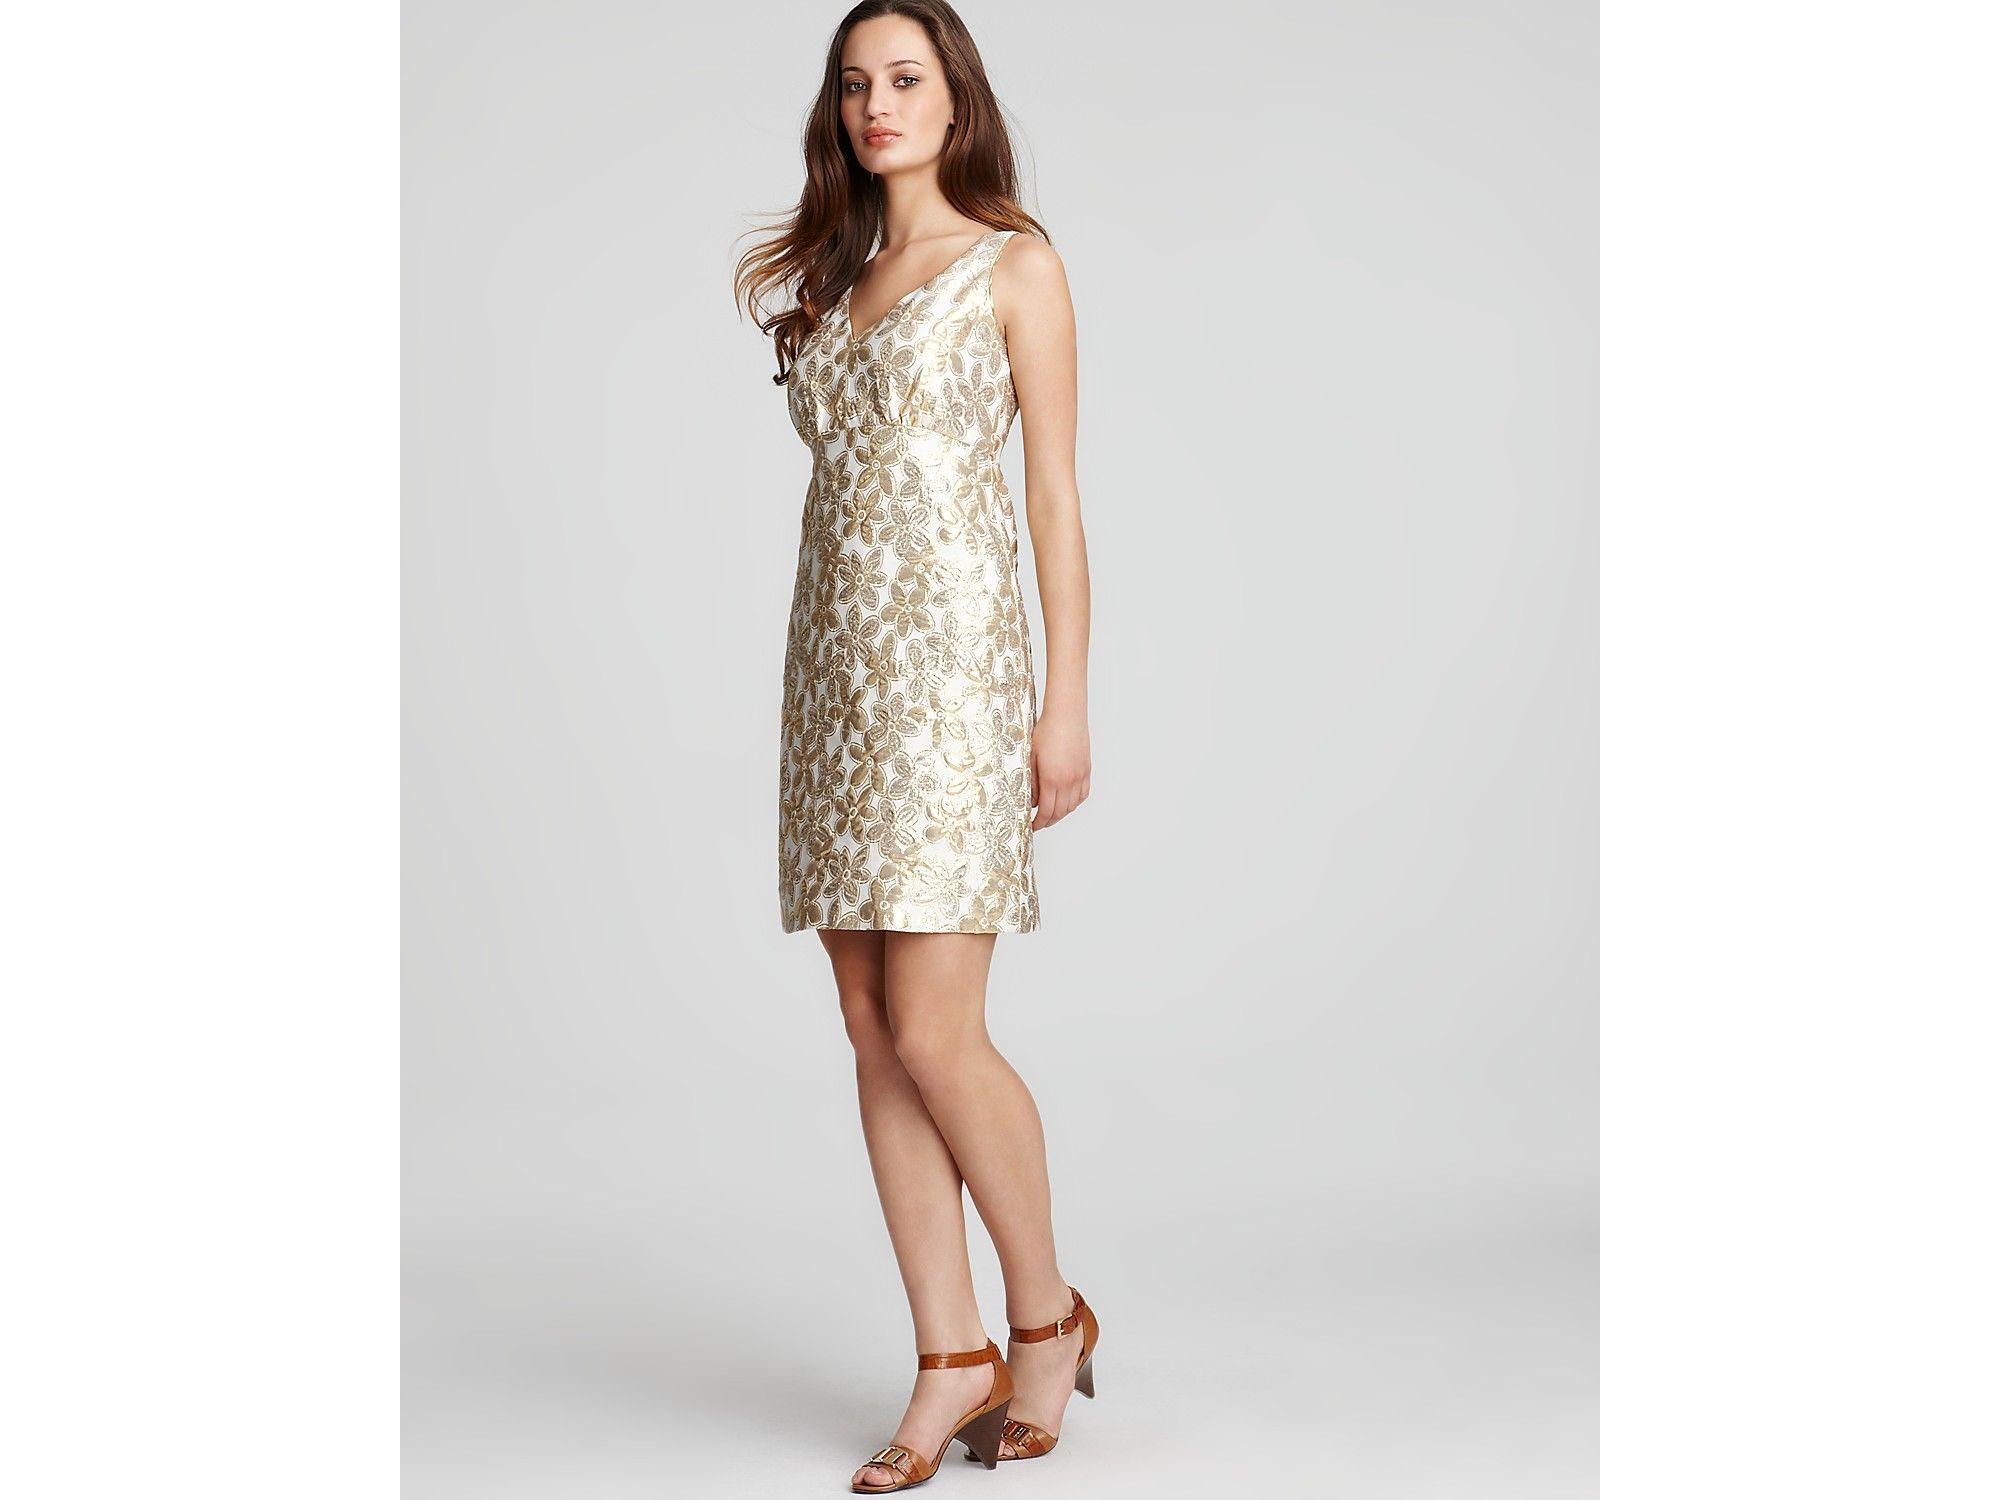 Kate spade new york naomi floral jacquard shimmer dress in natural